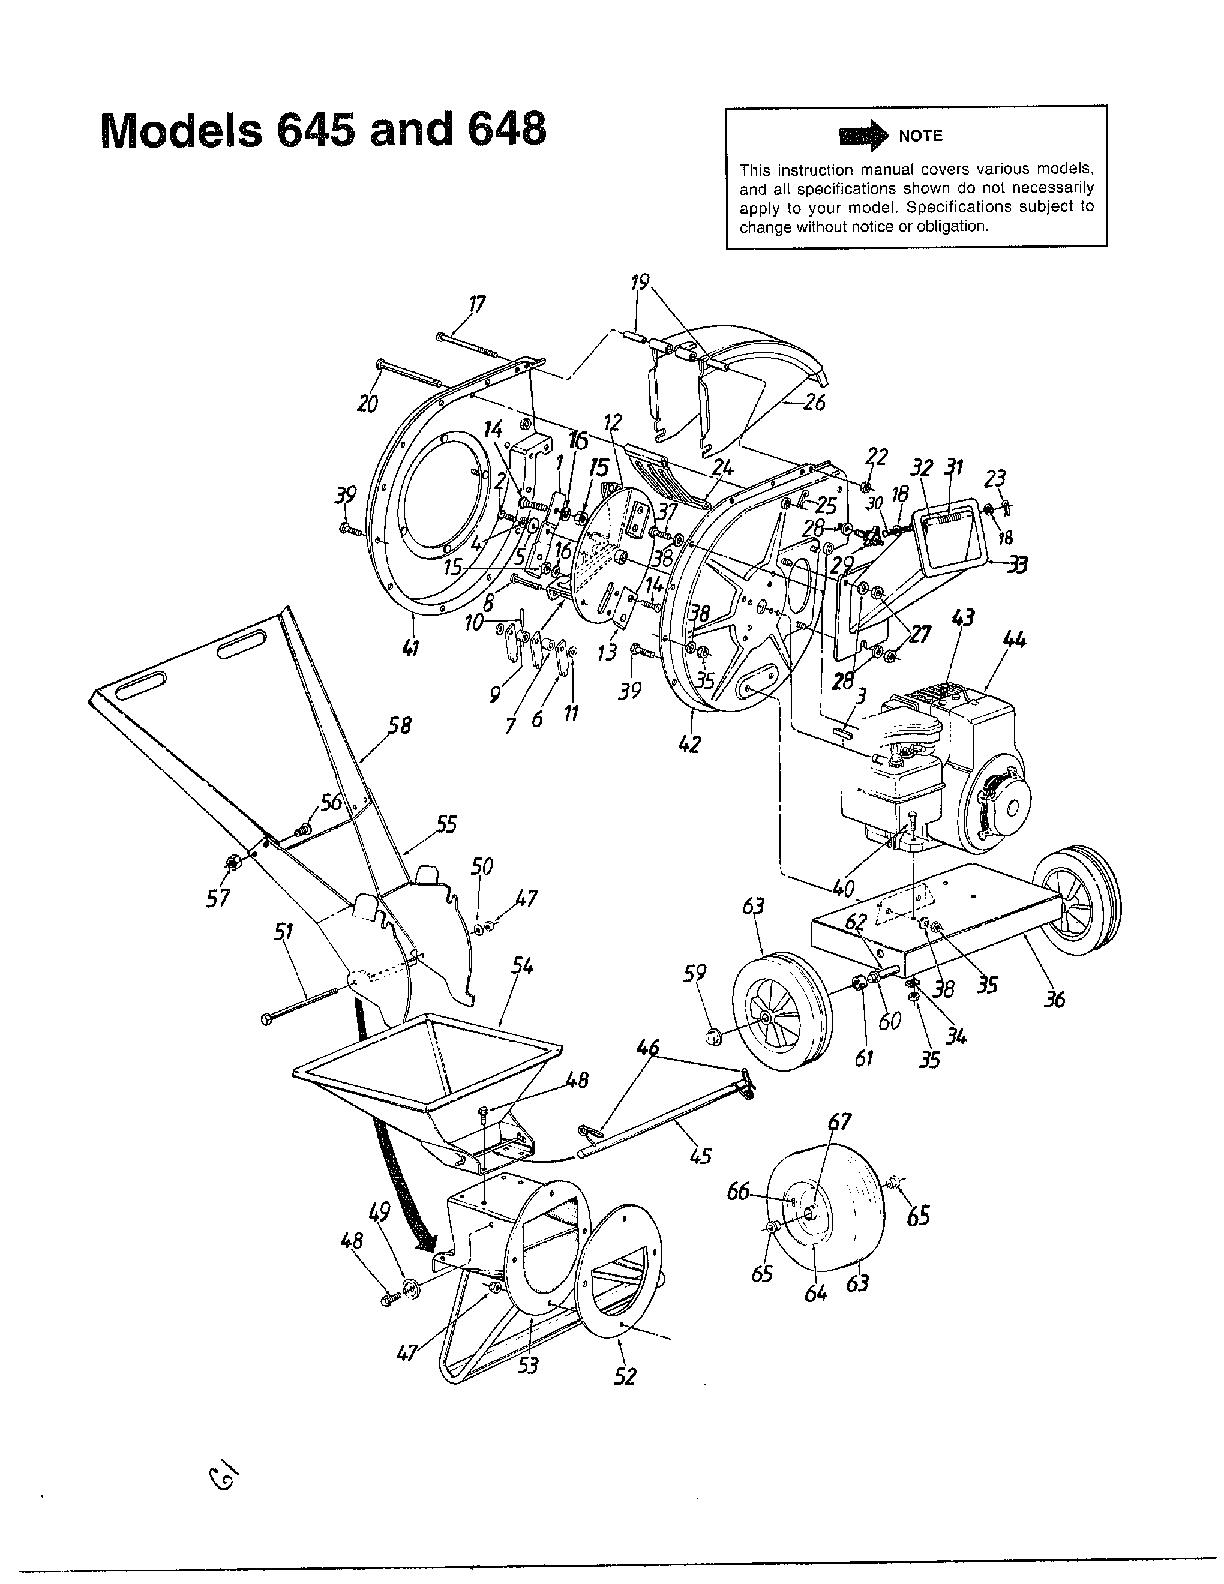 Mtd model 242A645-000 chipper shredder/vacuum, gas genuine